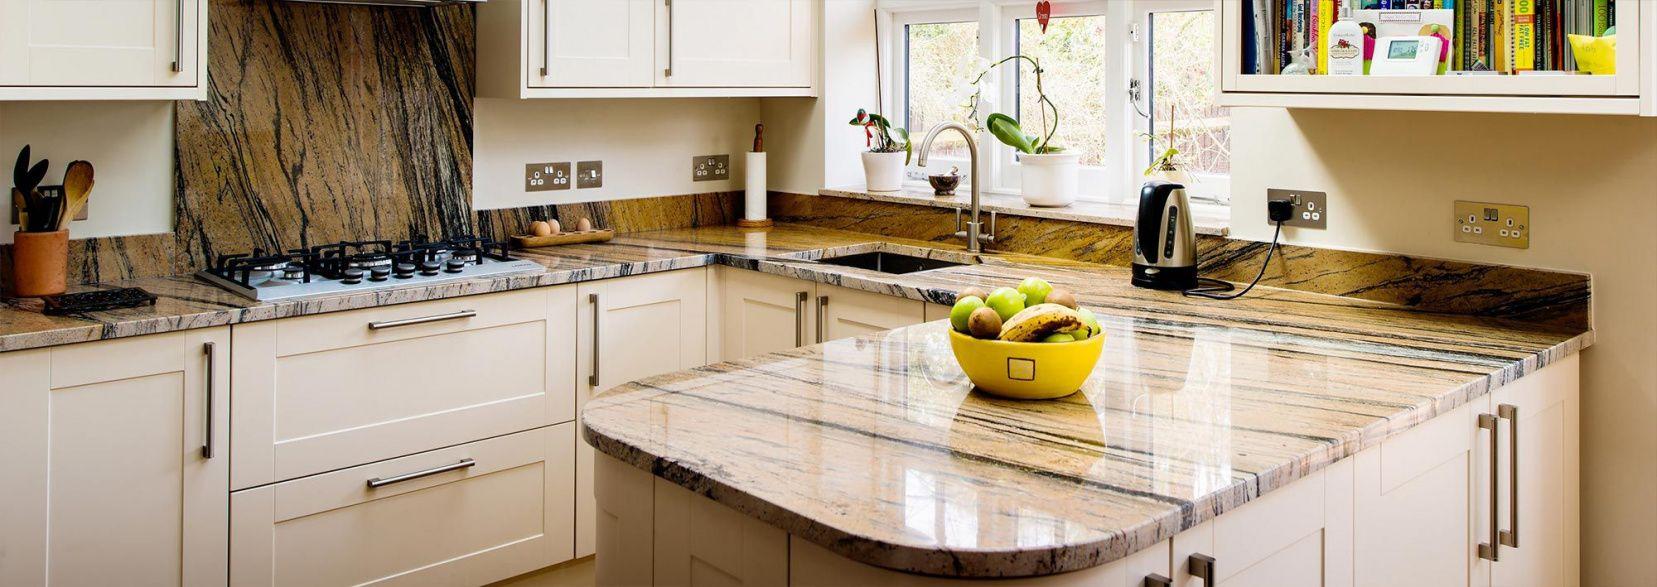 Charmant 77+ Can I Install Granite Countertops Myself   Unique Kitchen Backsplash  Ideas Check More At